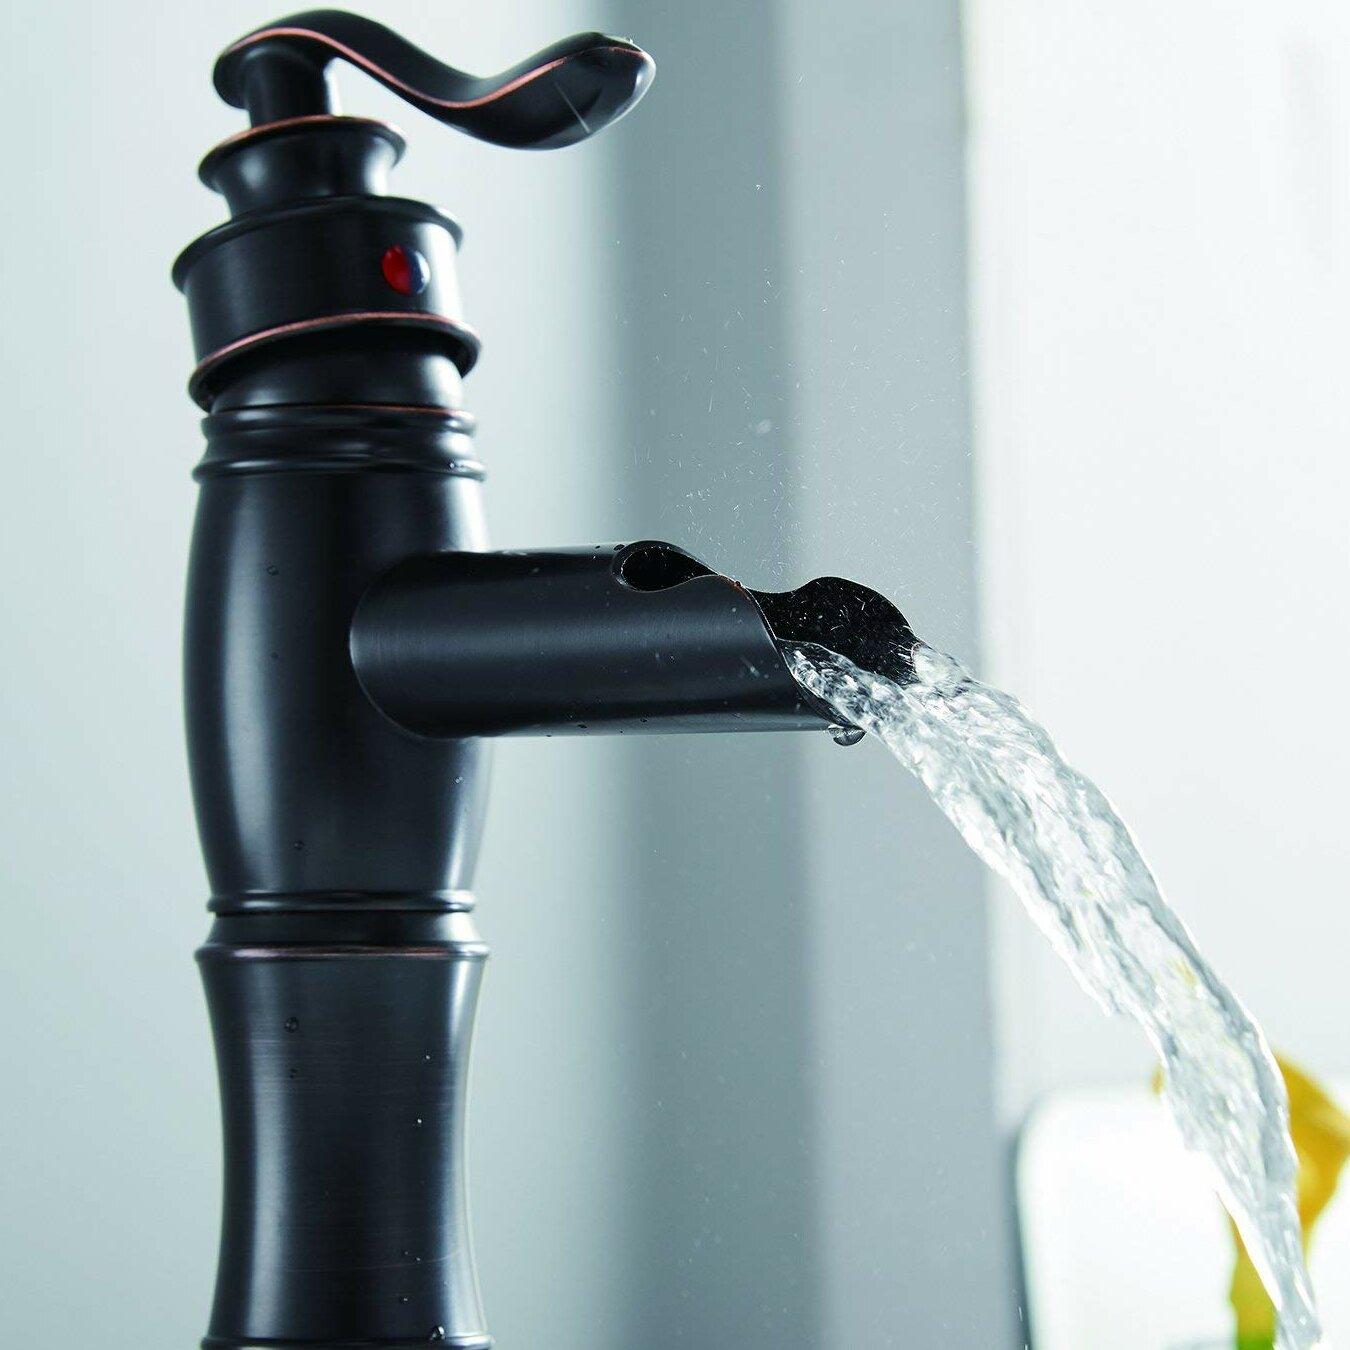 Aquafaucet DFI Waterfall Lavatory Deck Mount Sink Single Hole ...